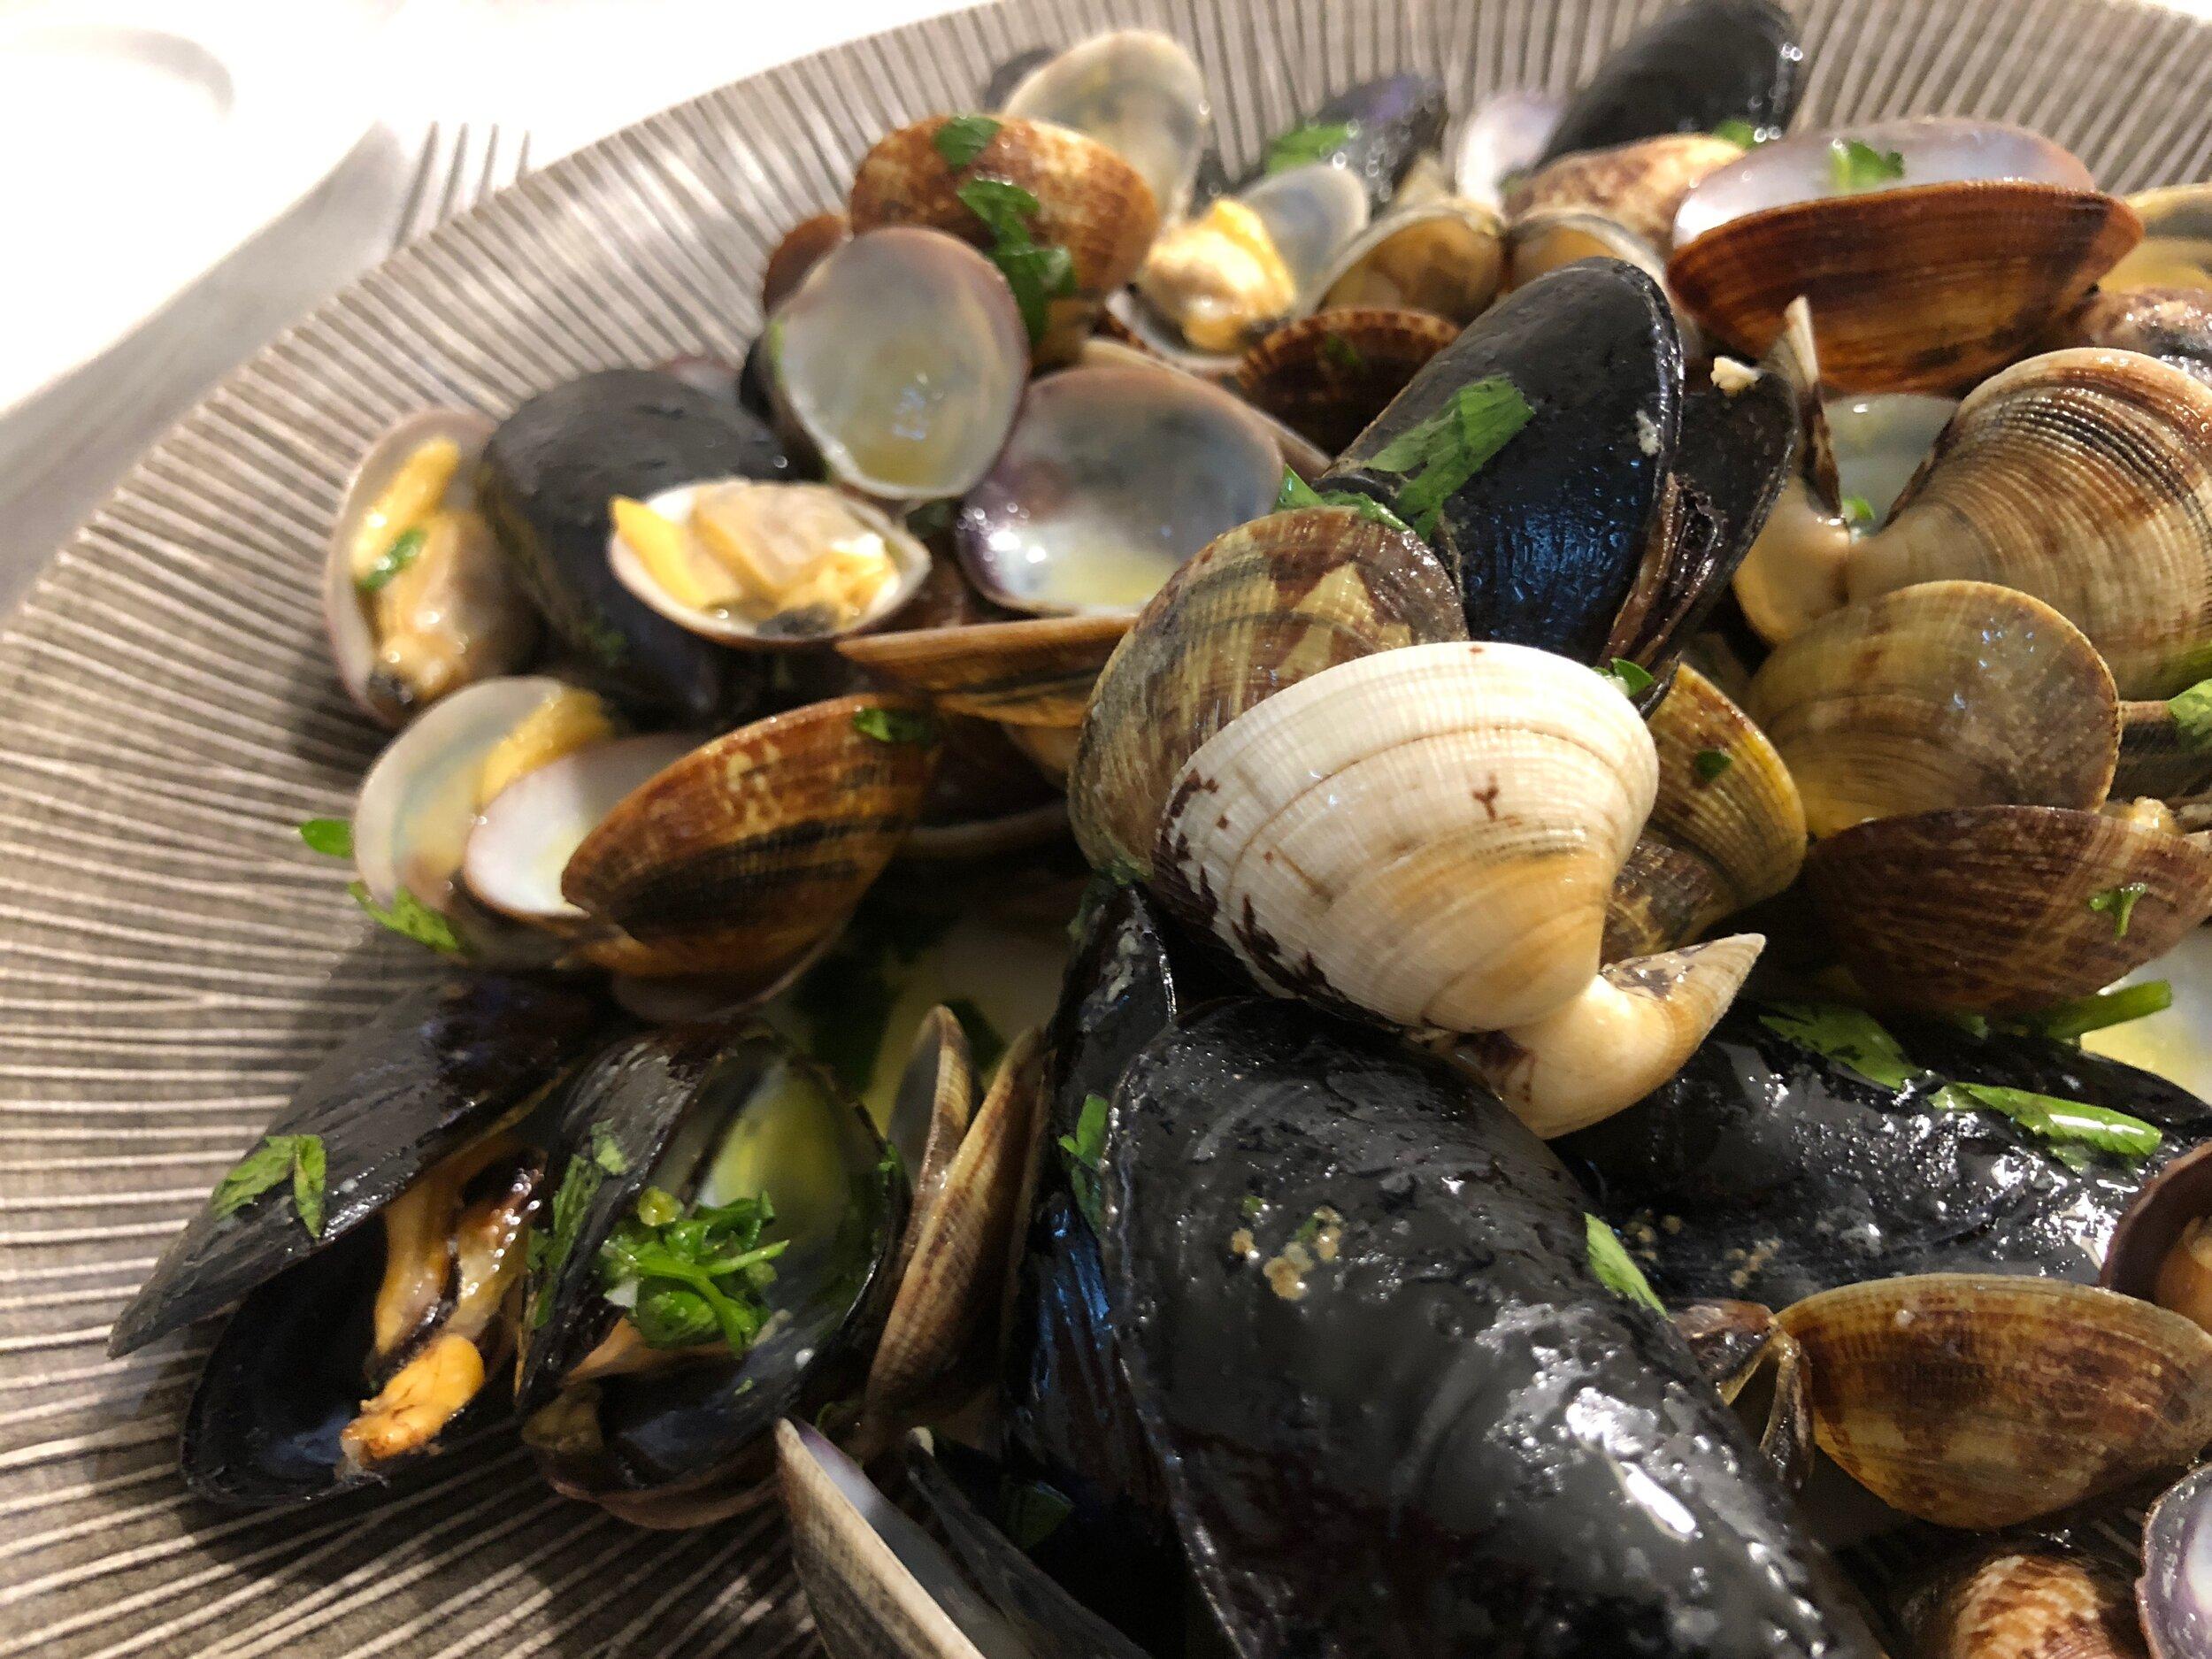 italy-sea-clams-foodie.jpeg